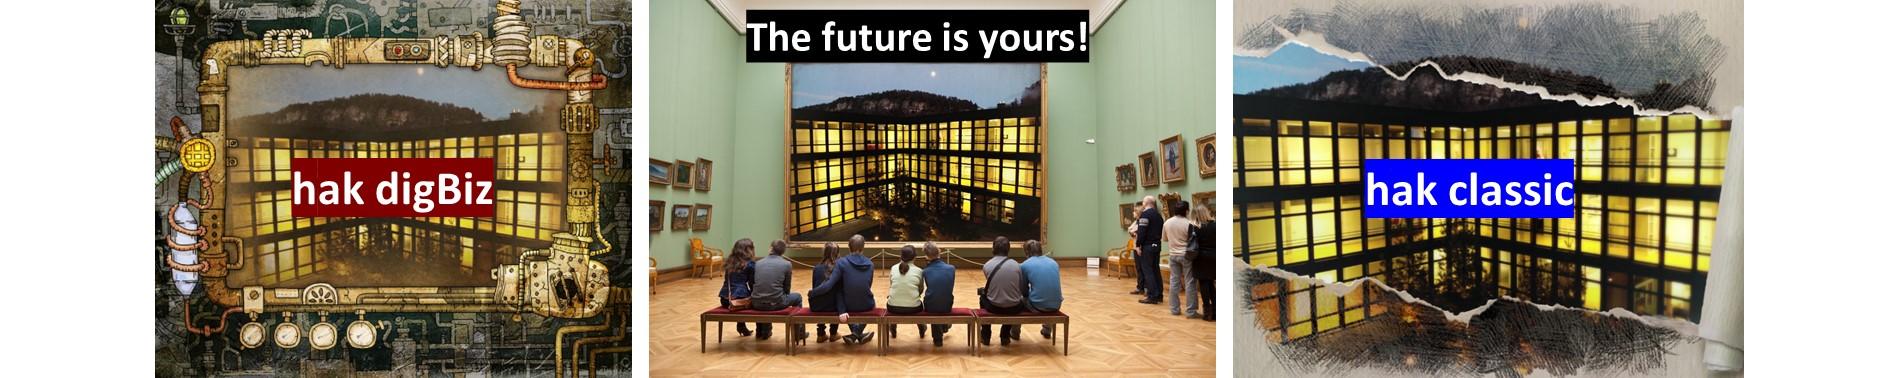 futureyours